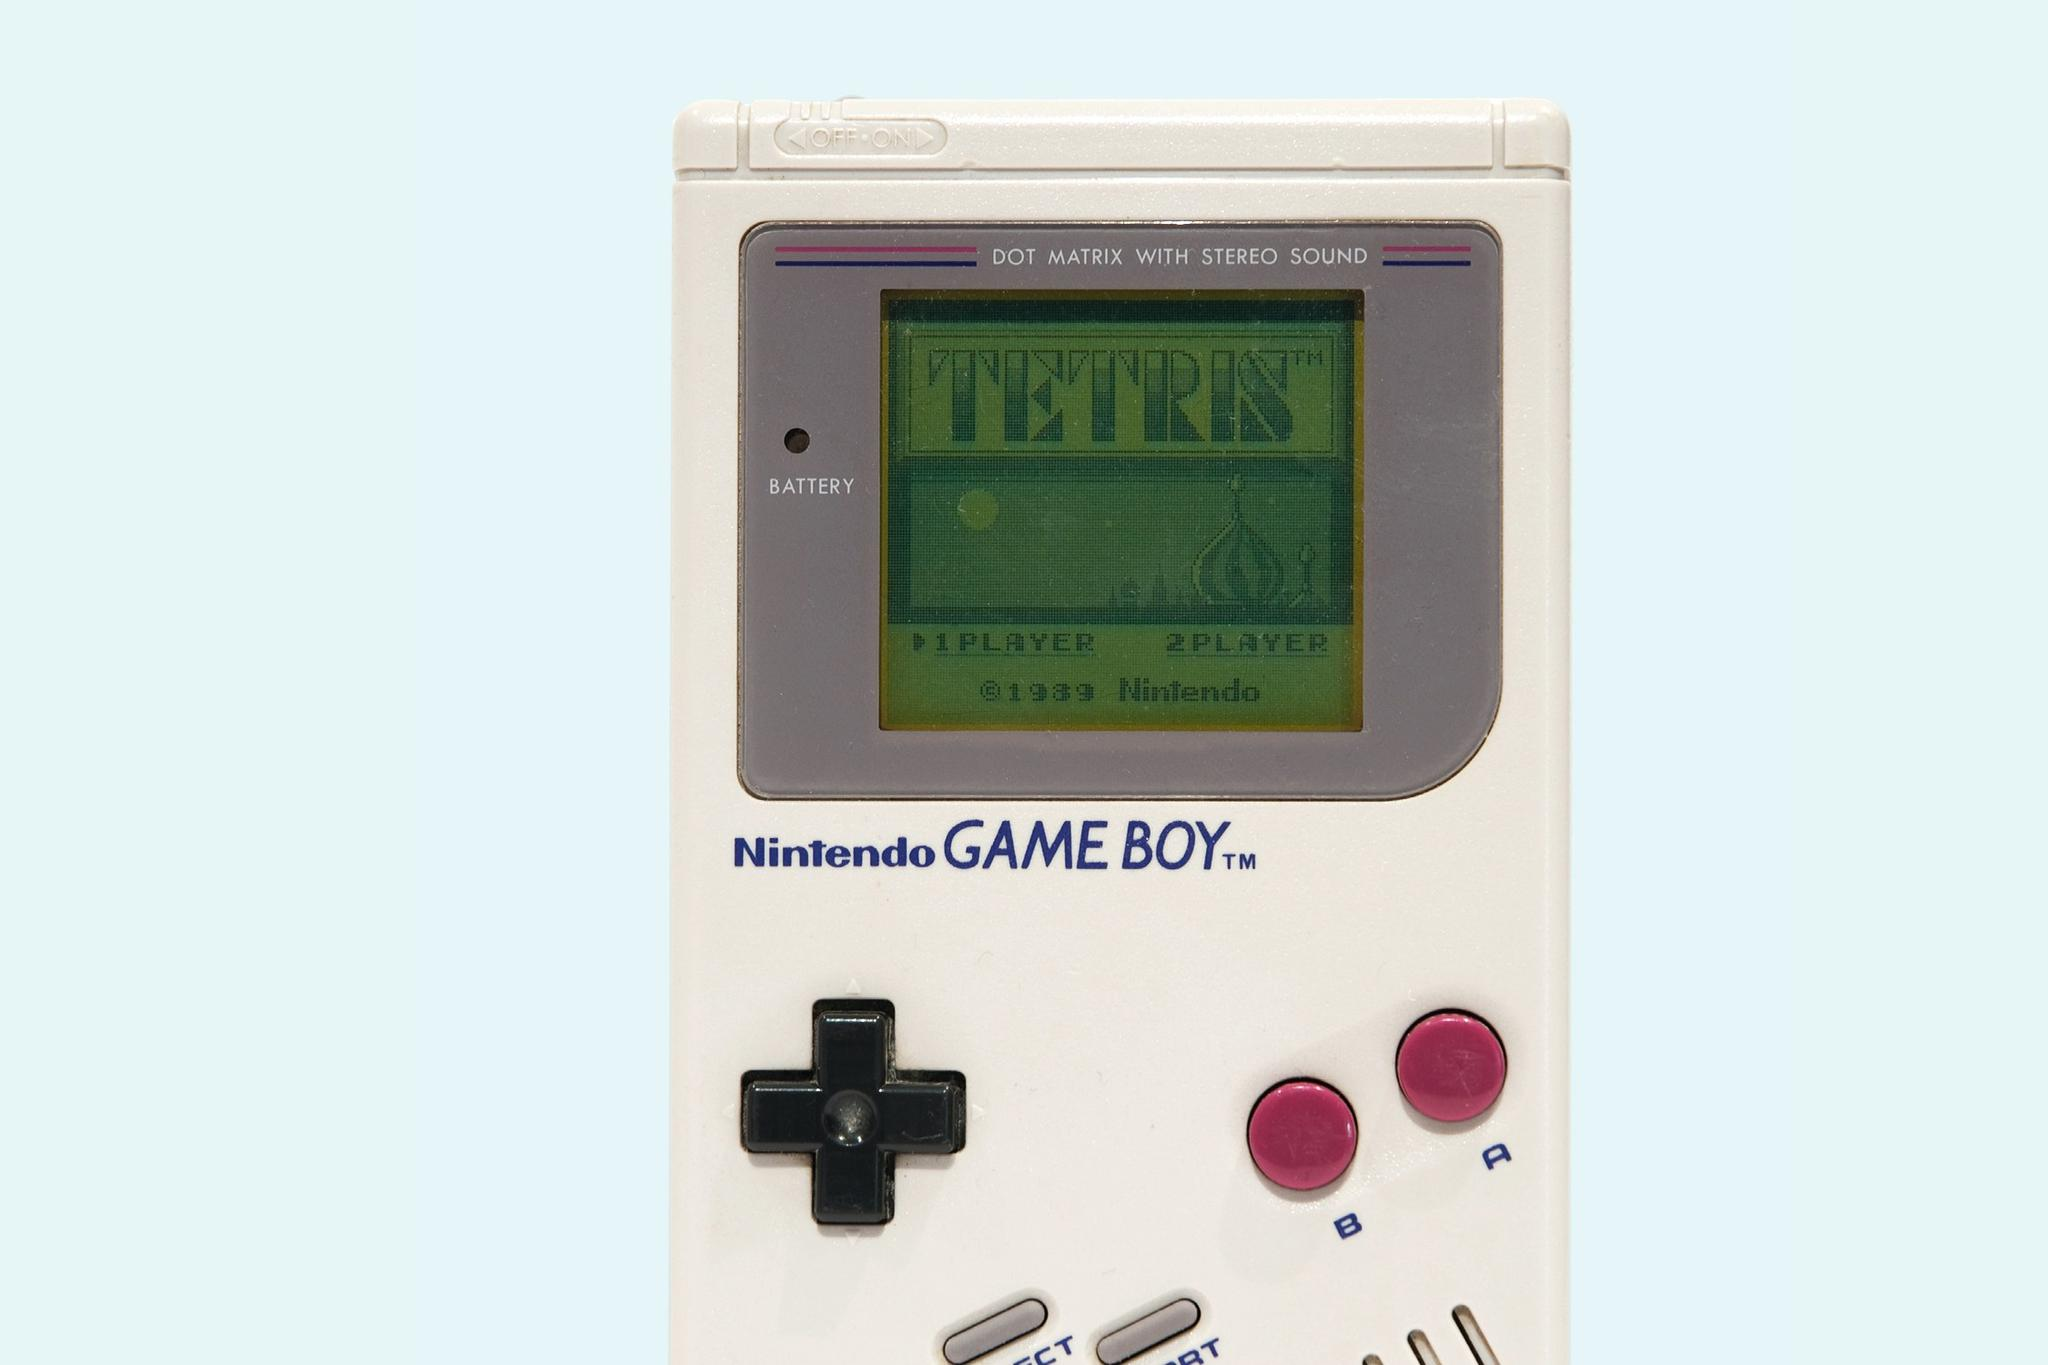 GameBoy掌机诞辰30周年 能击败它的只有任天堂自己